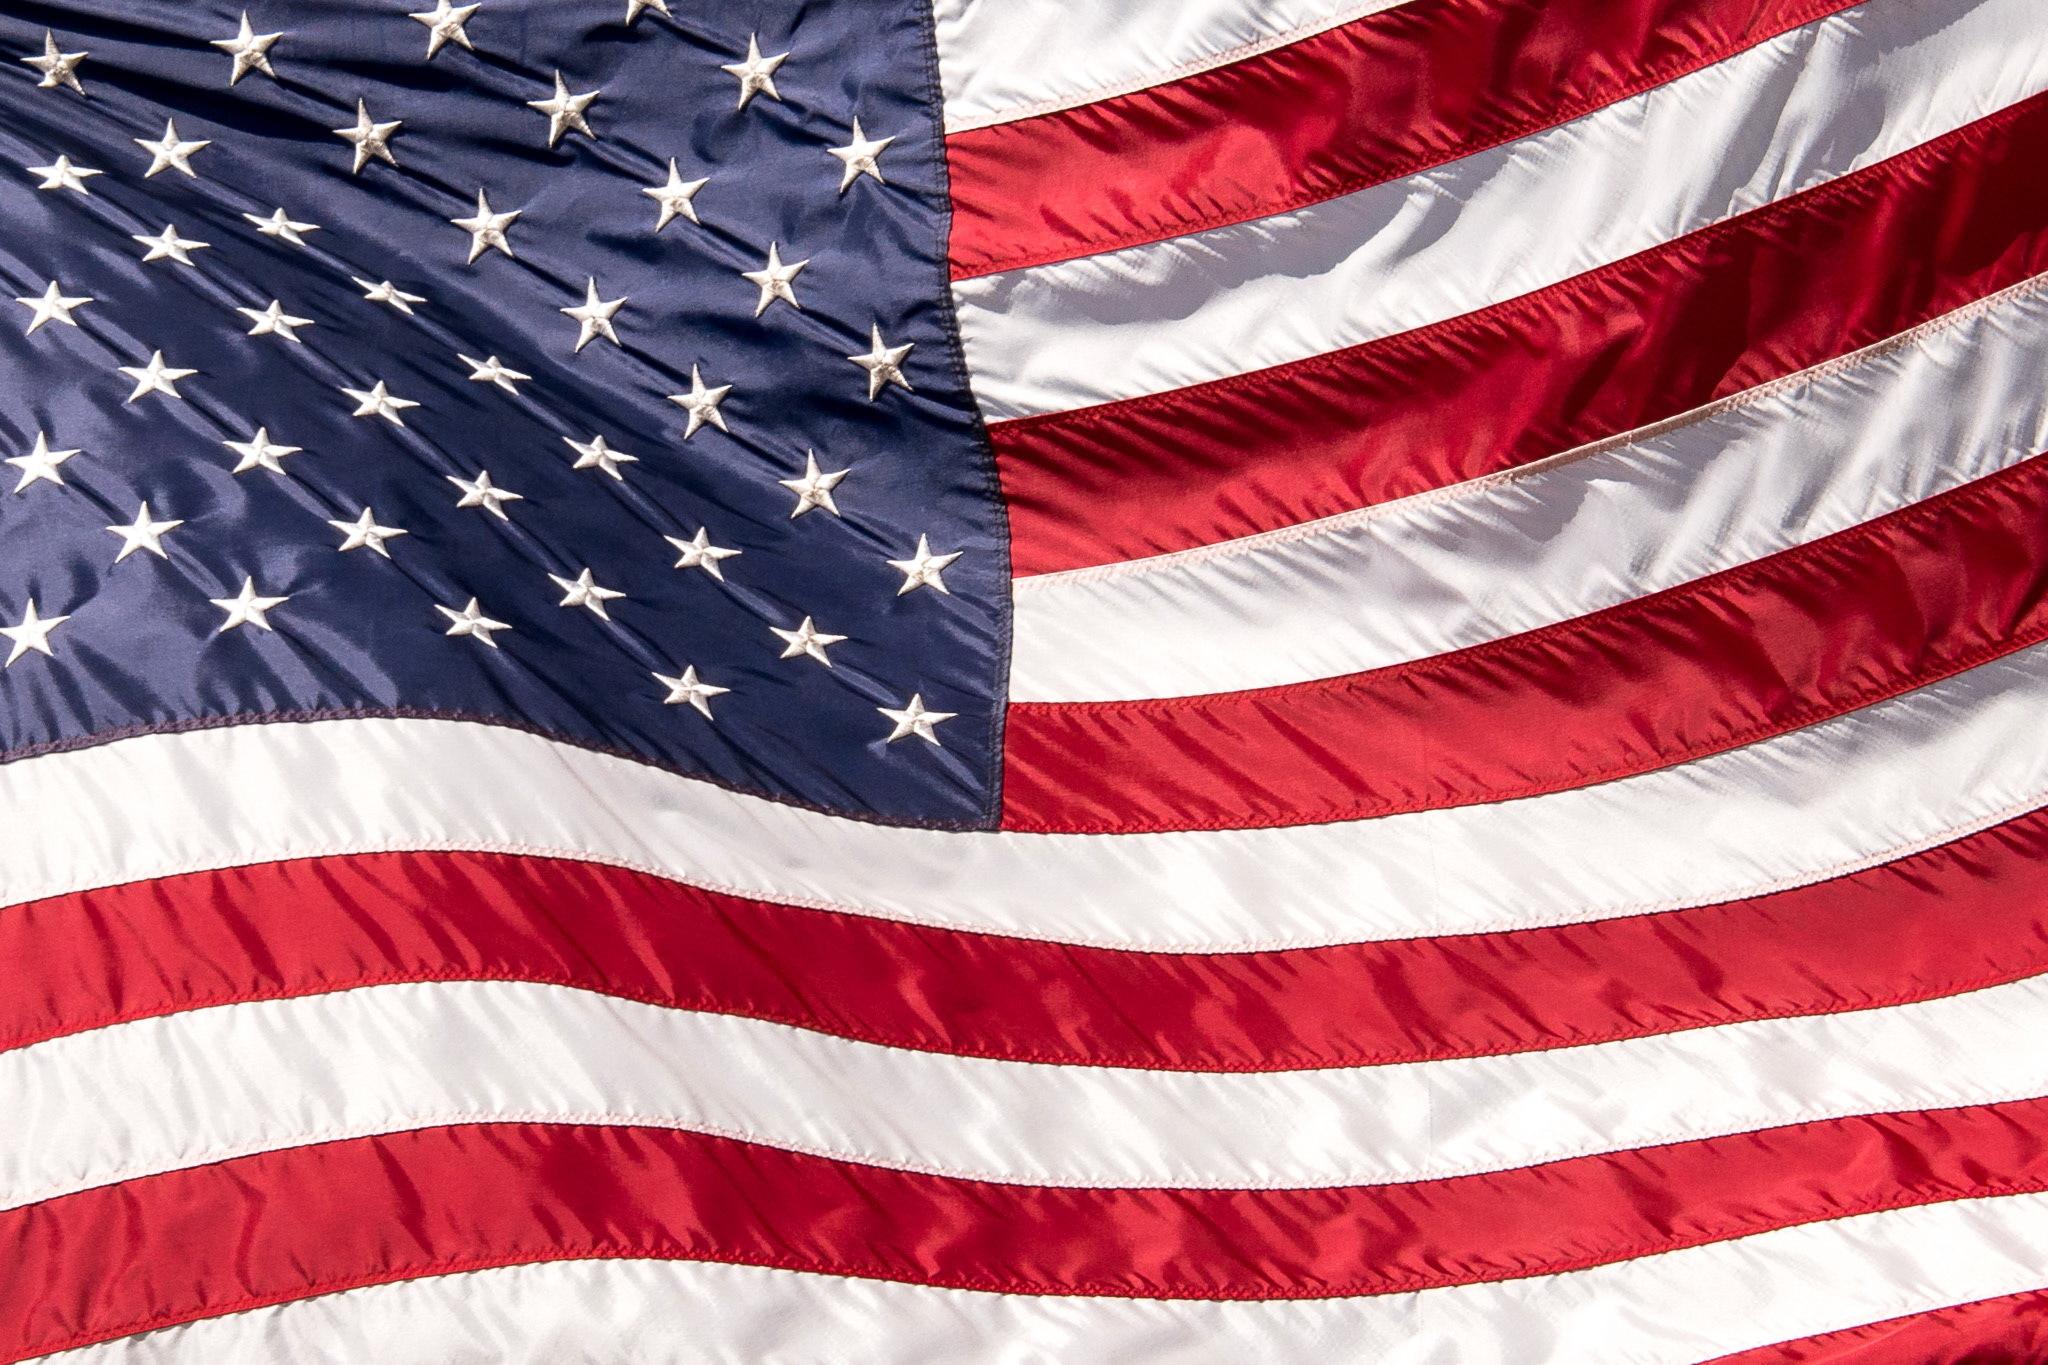 American flag hd wallpaper background image 2048x1365 - American flag hd ...